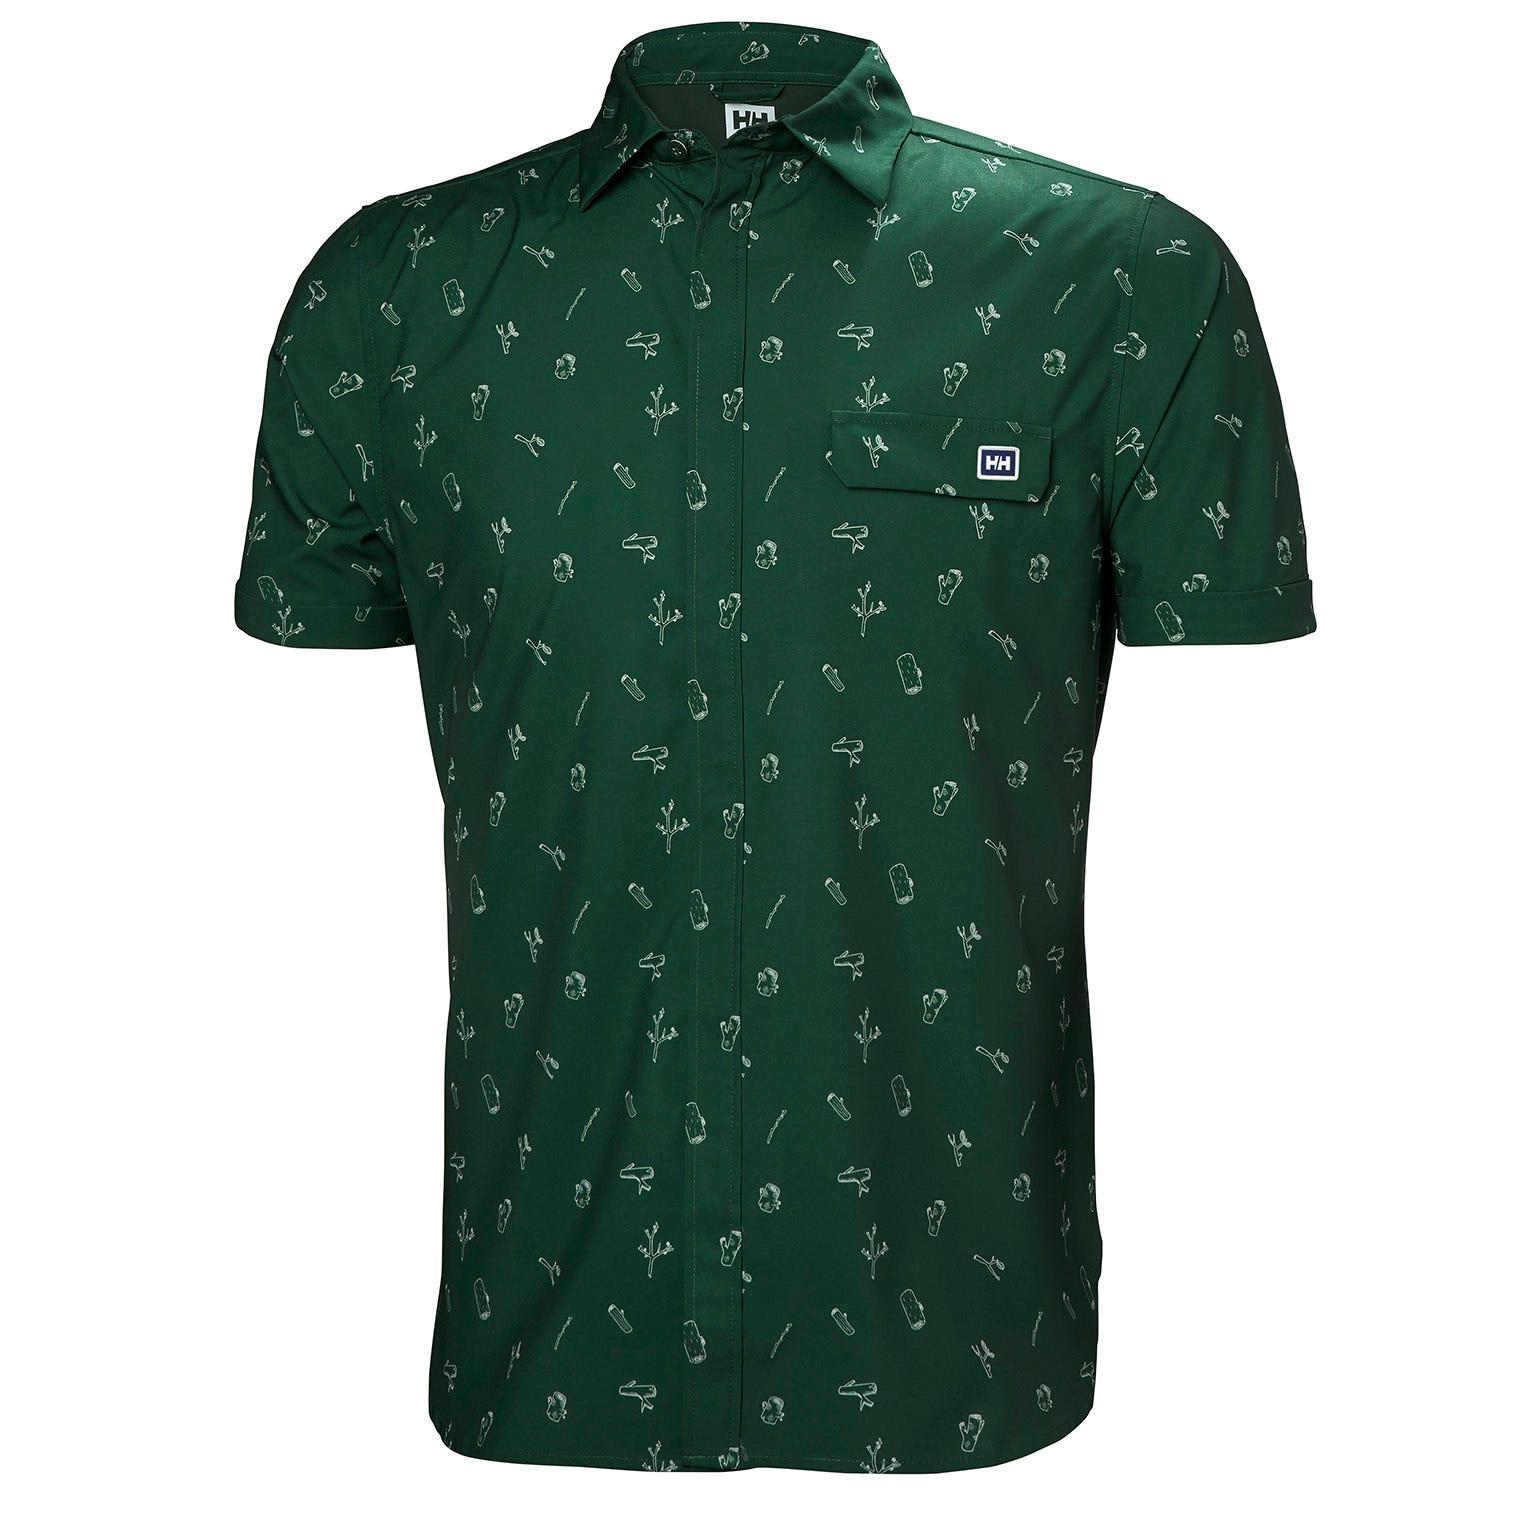 Helly Hansen Oya Shirt Mens Midlayer Green L